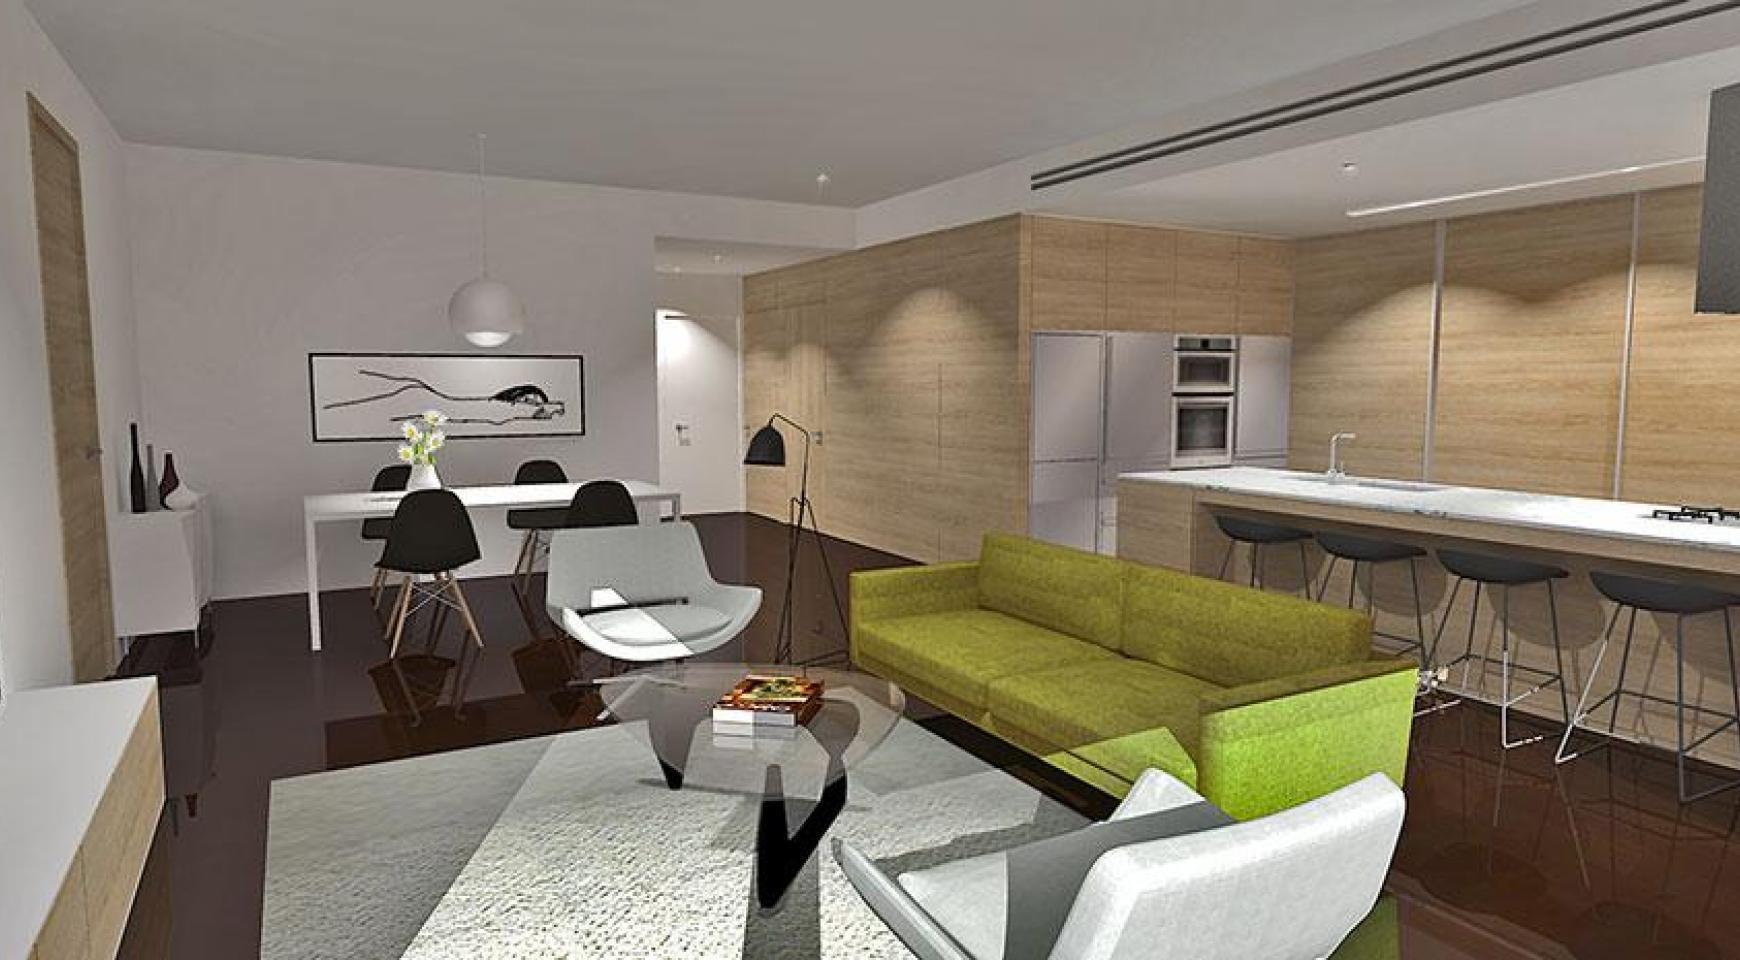 Spacious 4 Bedroom Villa in a New Complex in Agios Athanasios - 4